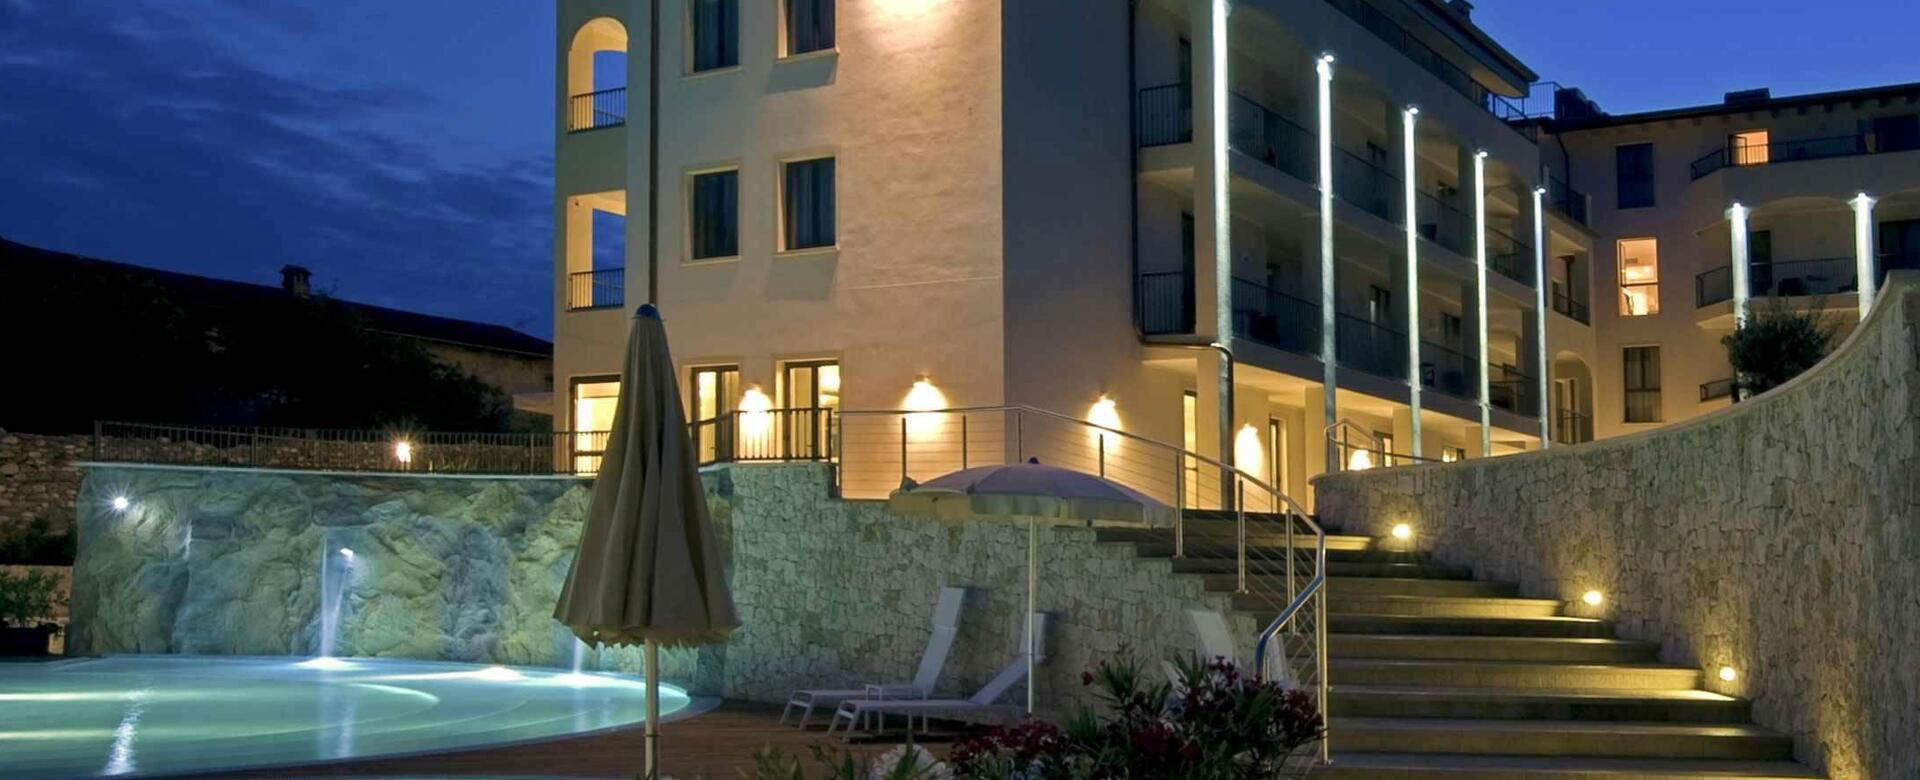 hotelvillaluisa de gardasee 004